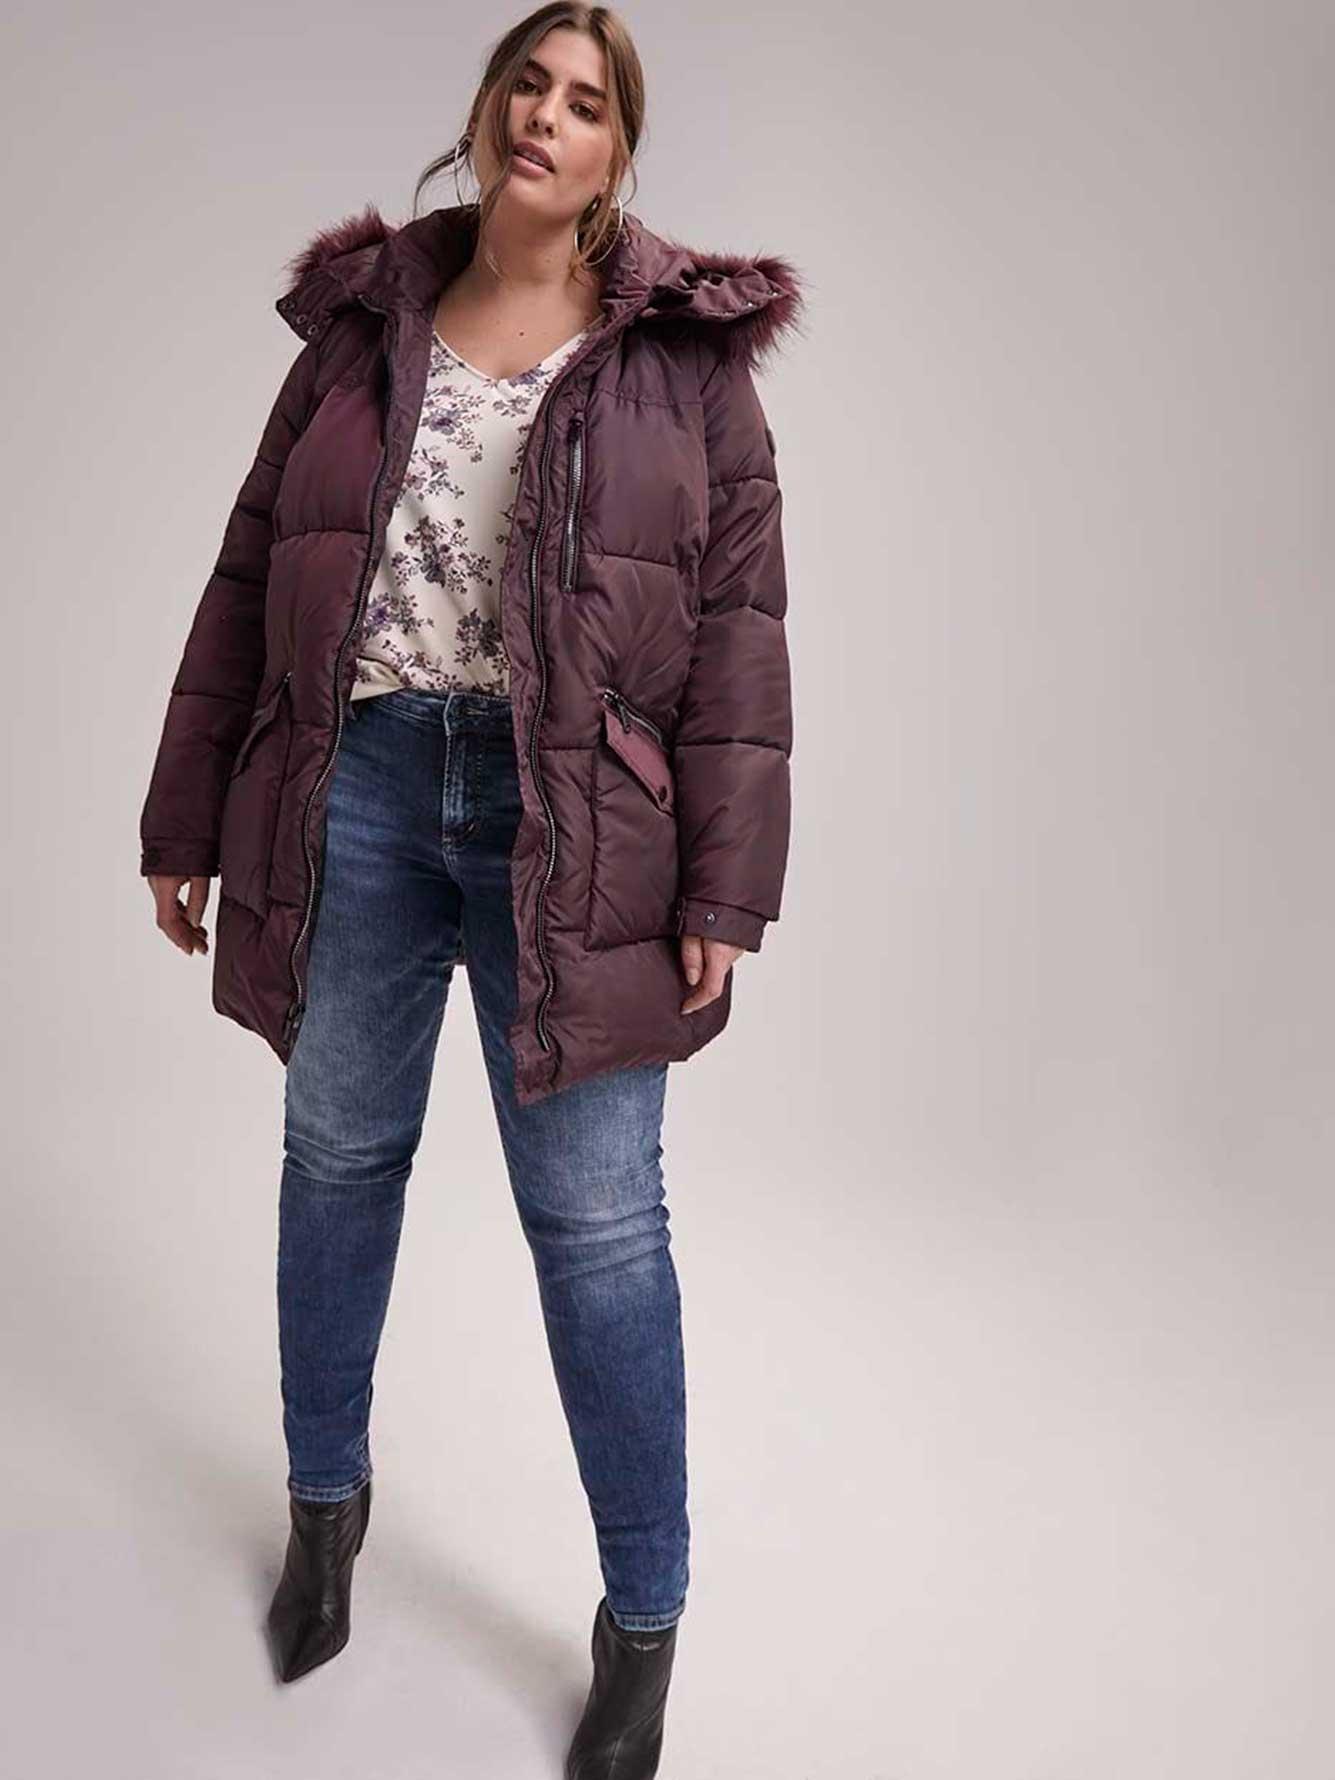 53d6ae30bfc Jacket with Faux Fur Hood Trim - RACHEL Rachel Roy | Addition Elle